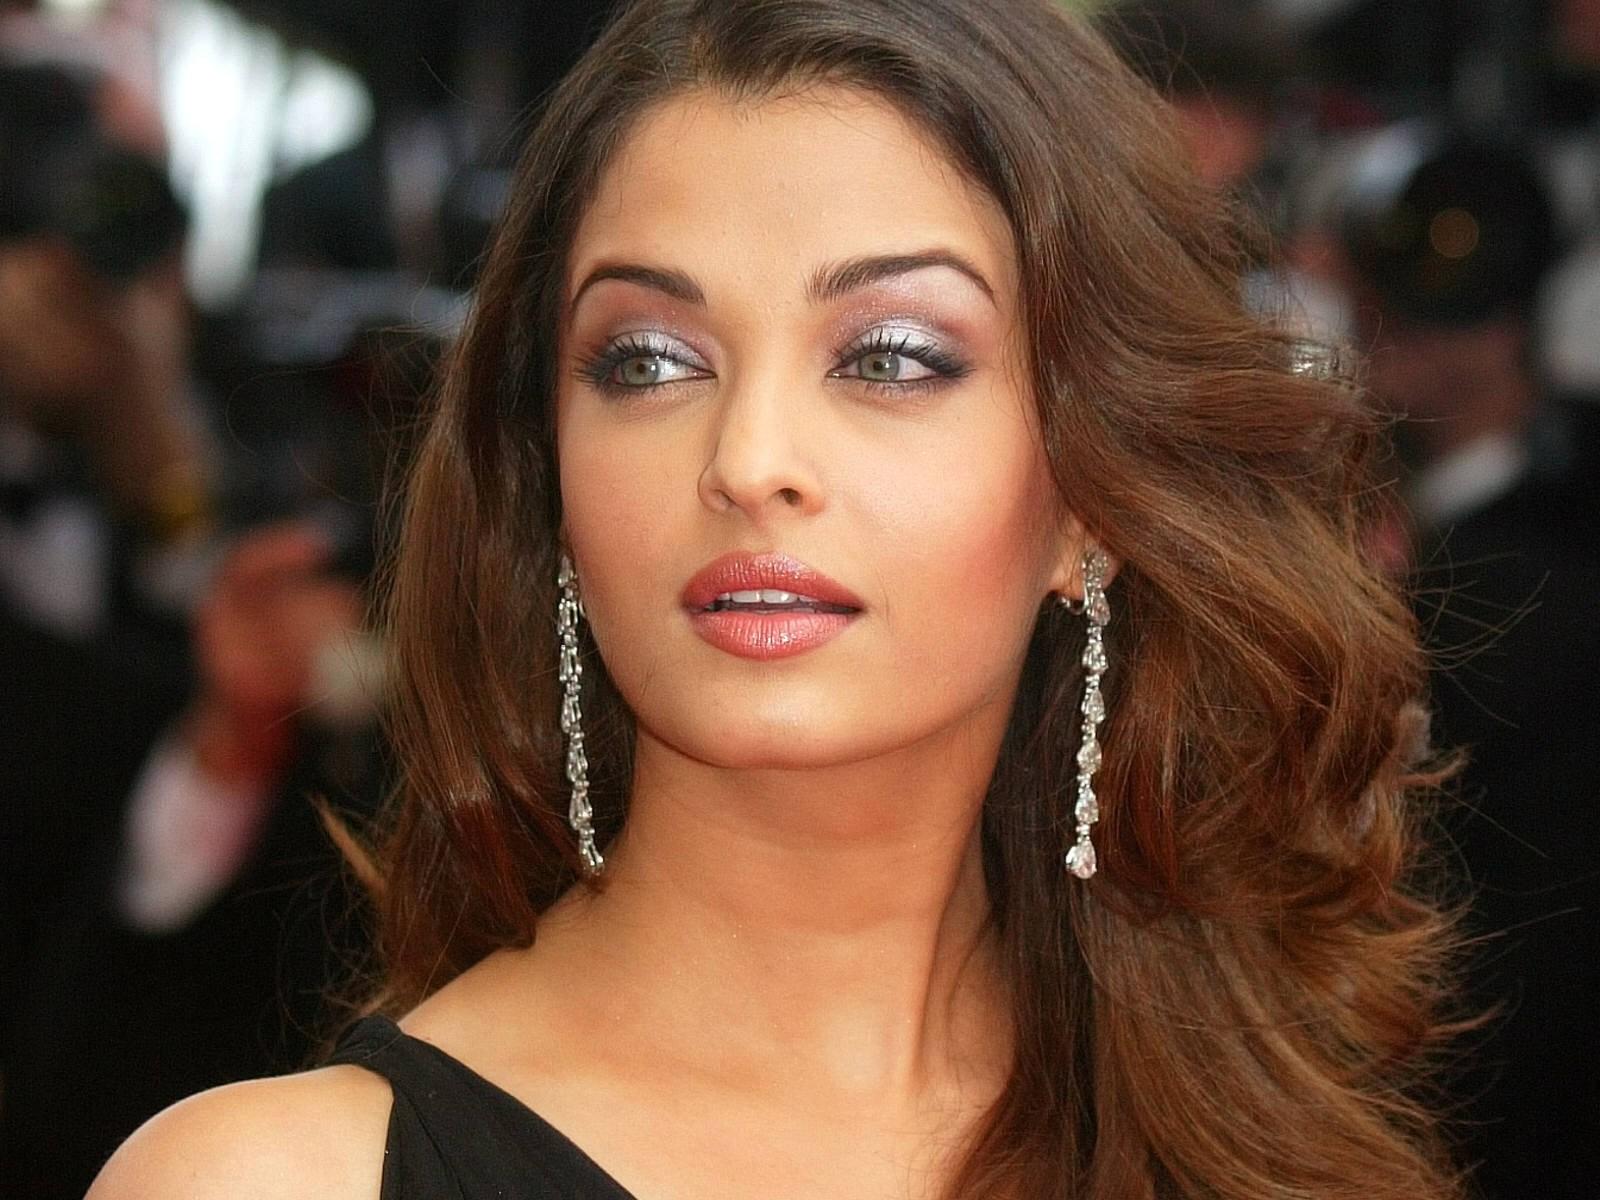 hollywood actresses wallpapers - hot wallpapers hd: aishwarya rai photos